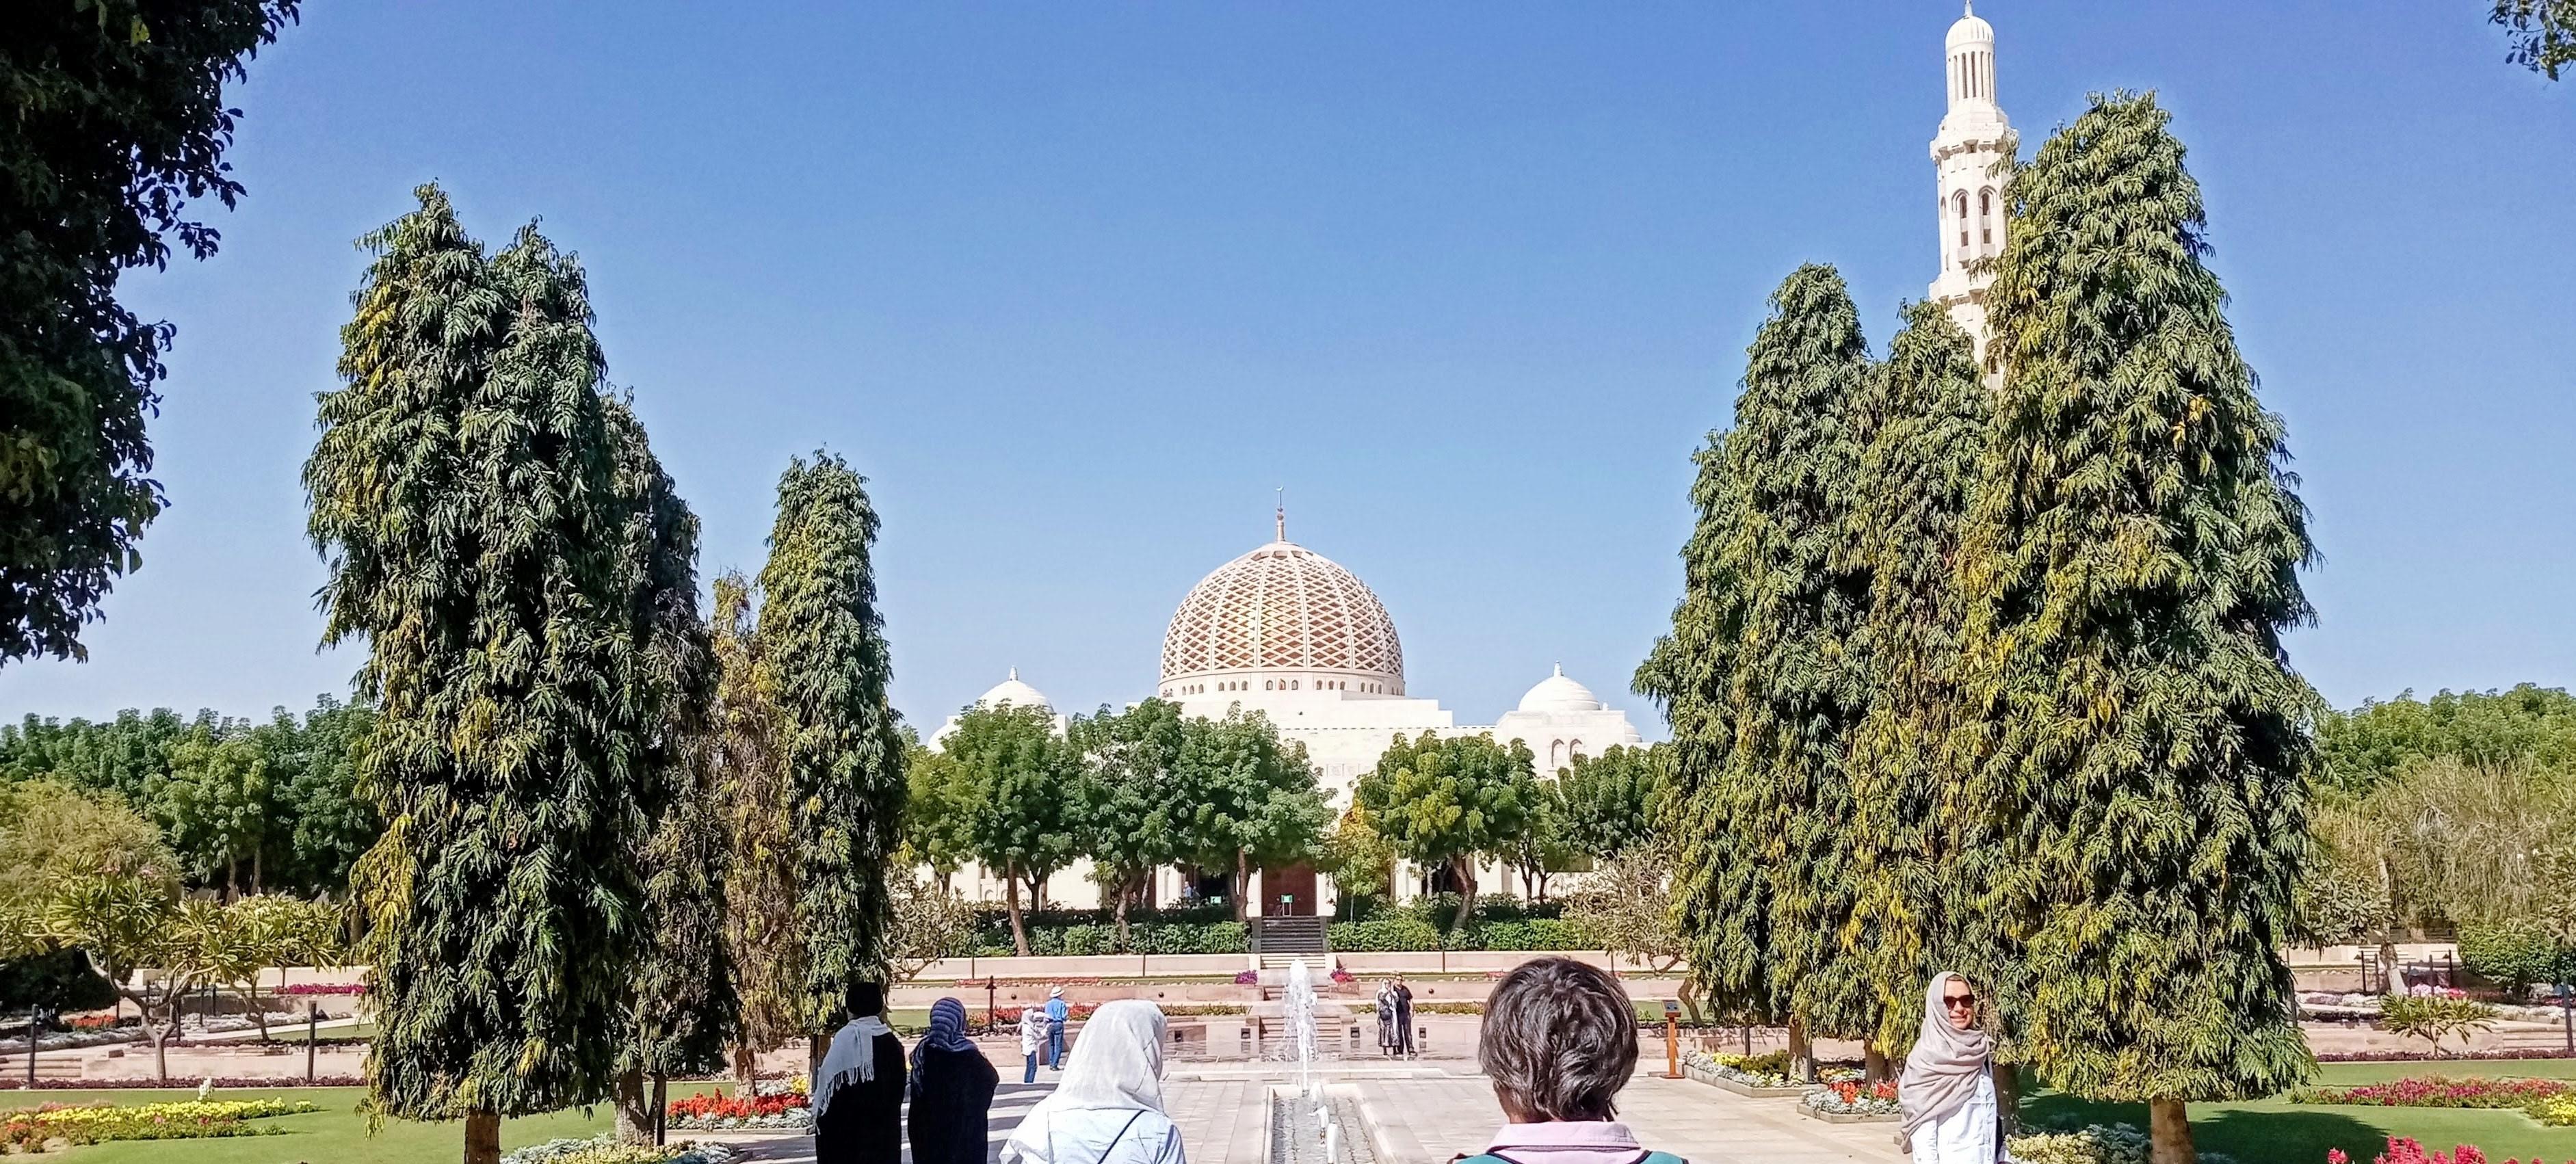 Oman Temple